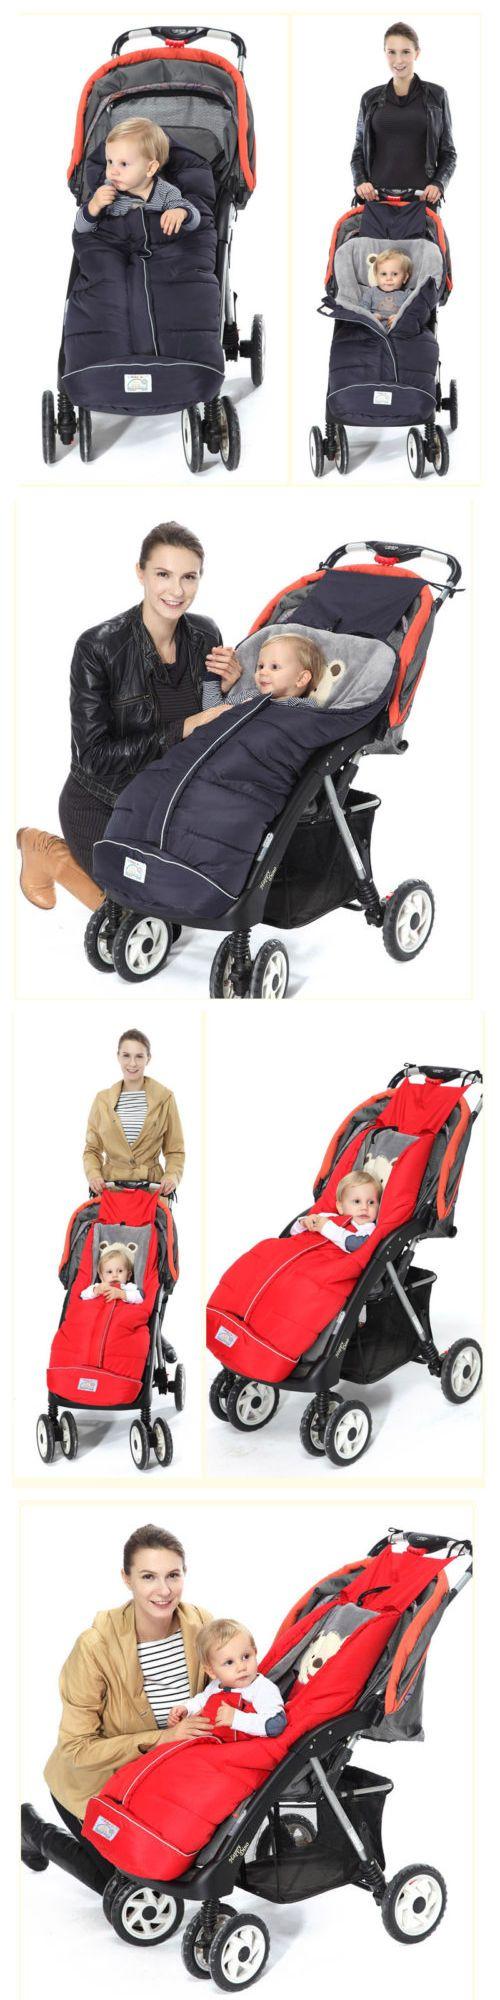 Footmuffs 116553: Baby Strollers Pushchairs Prams Cot Bed Footmuff Sleeping Bag Blanket Cosy 6-24M -> BUY IT NOW ONLY: $33.99 on eBay!